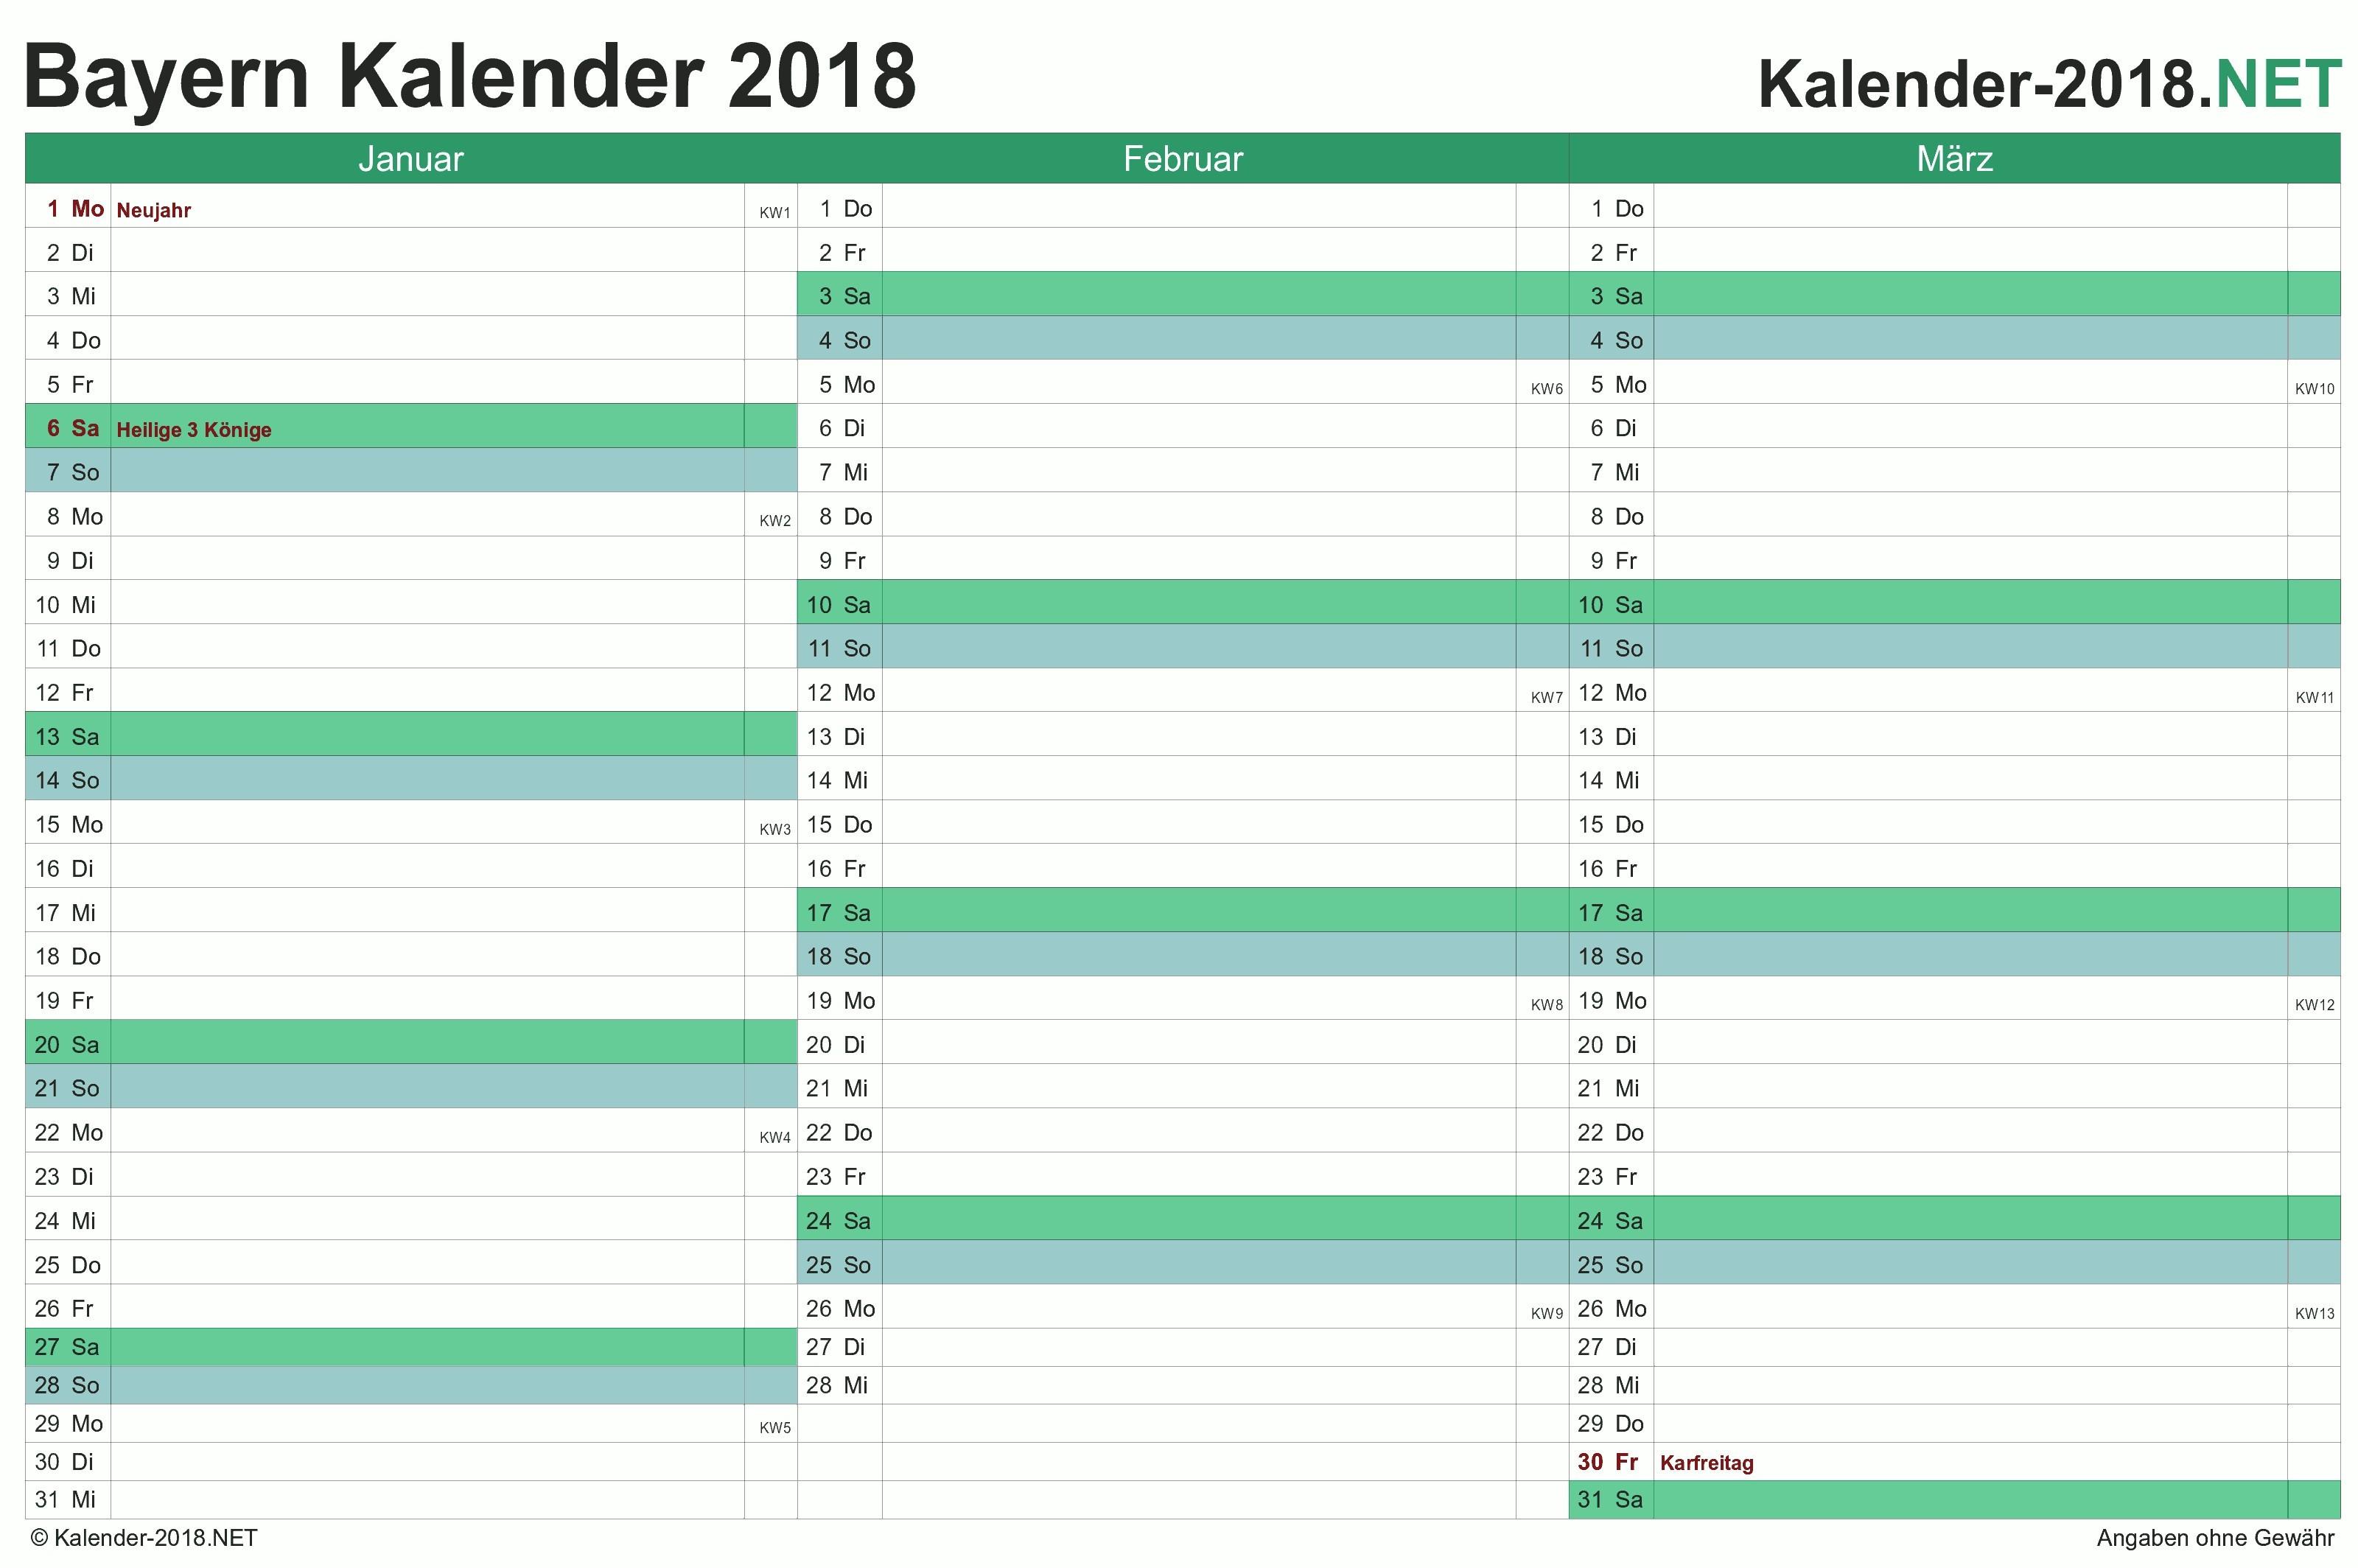 Revisar Kalender 2019 Pdf Kalenderpedia